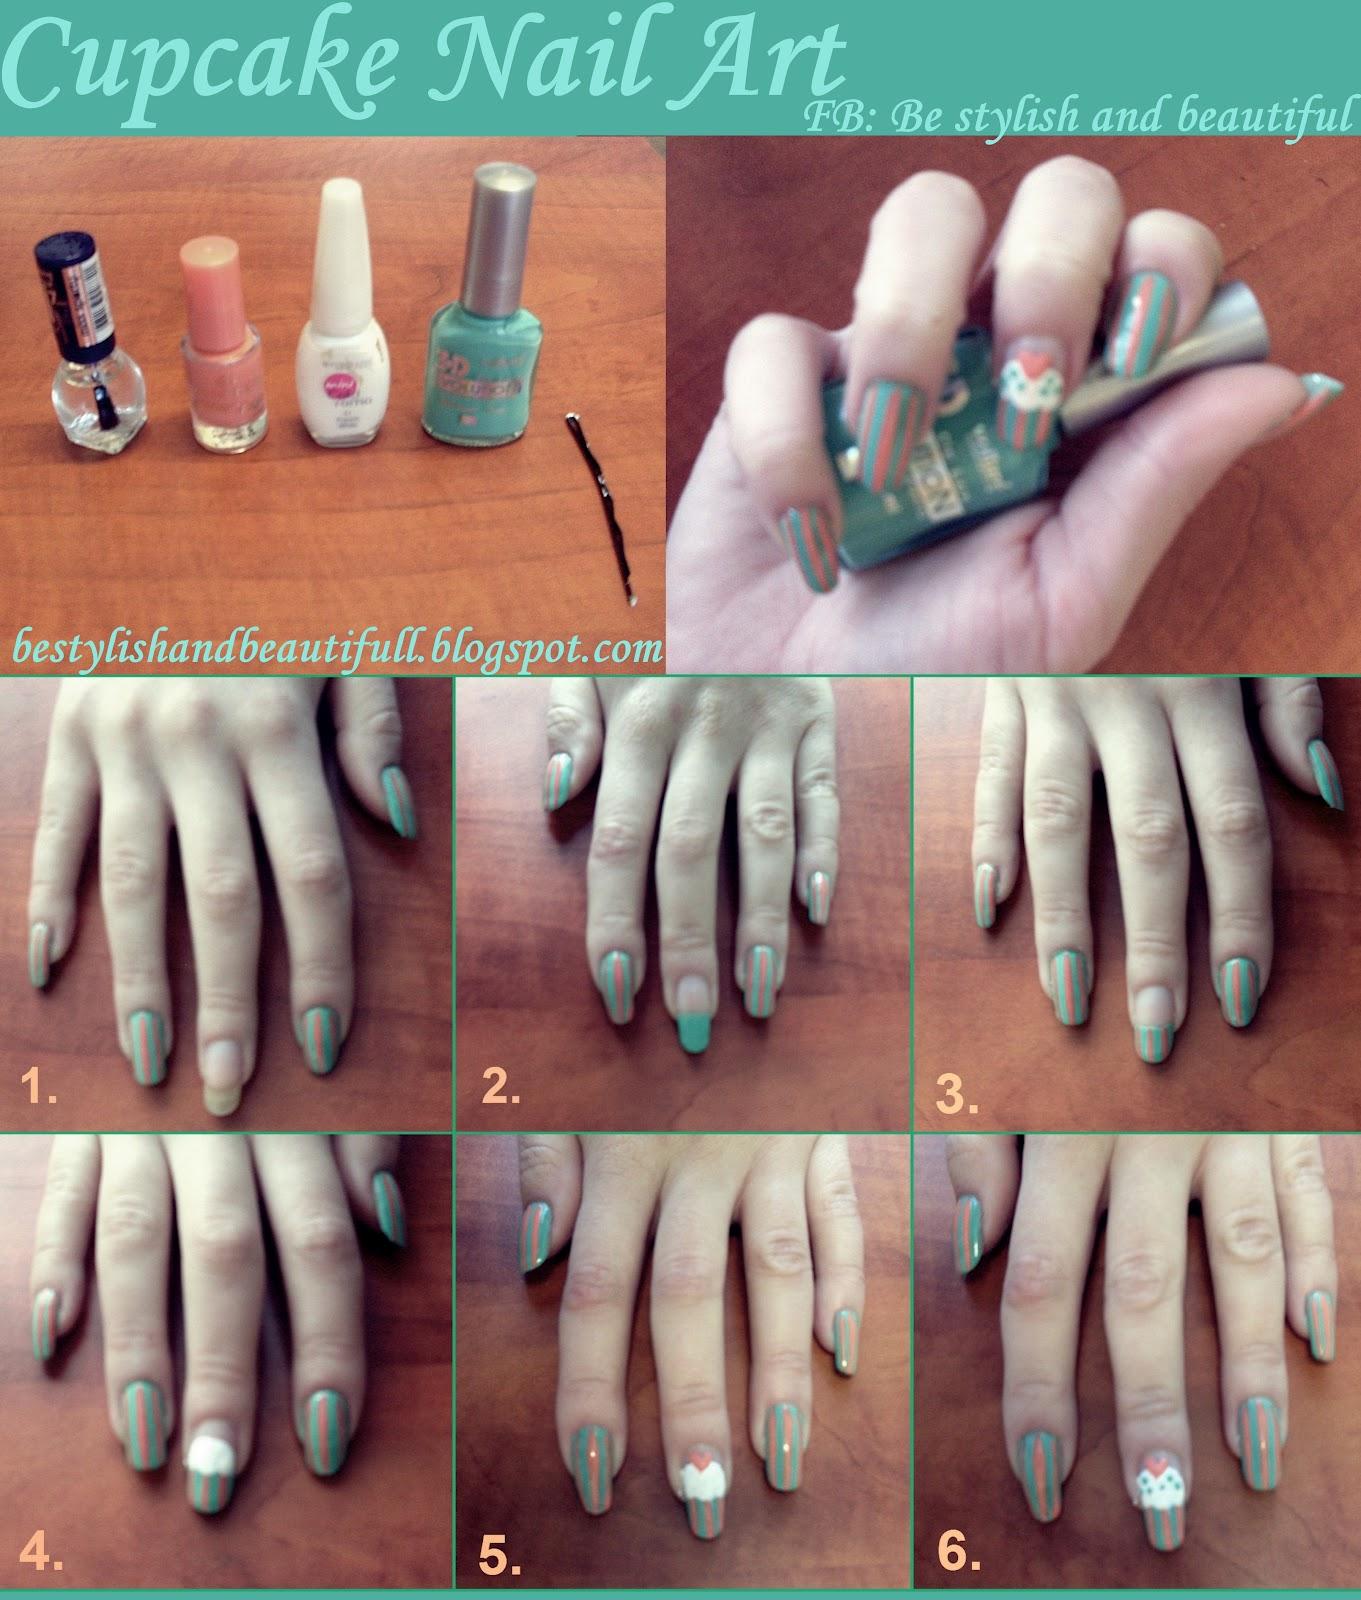 Cute cupcake nail art tutorial be stylish and beautiful prinsesfo Choice Image